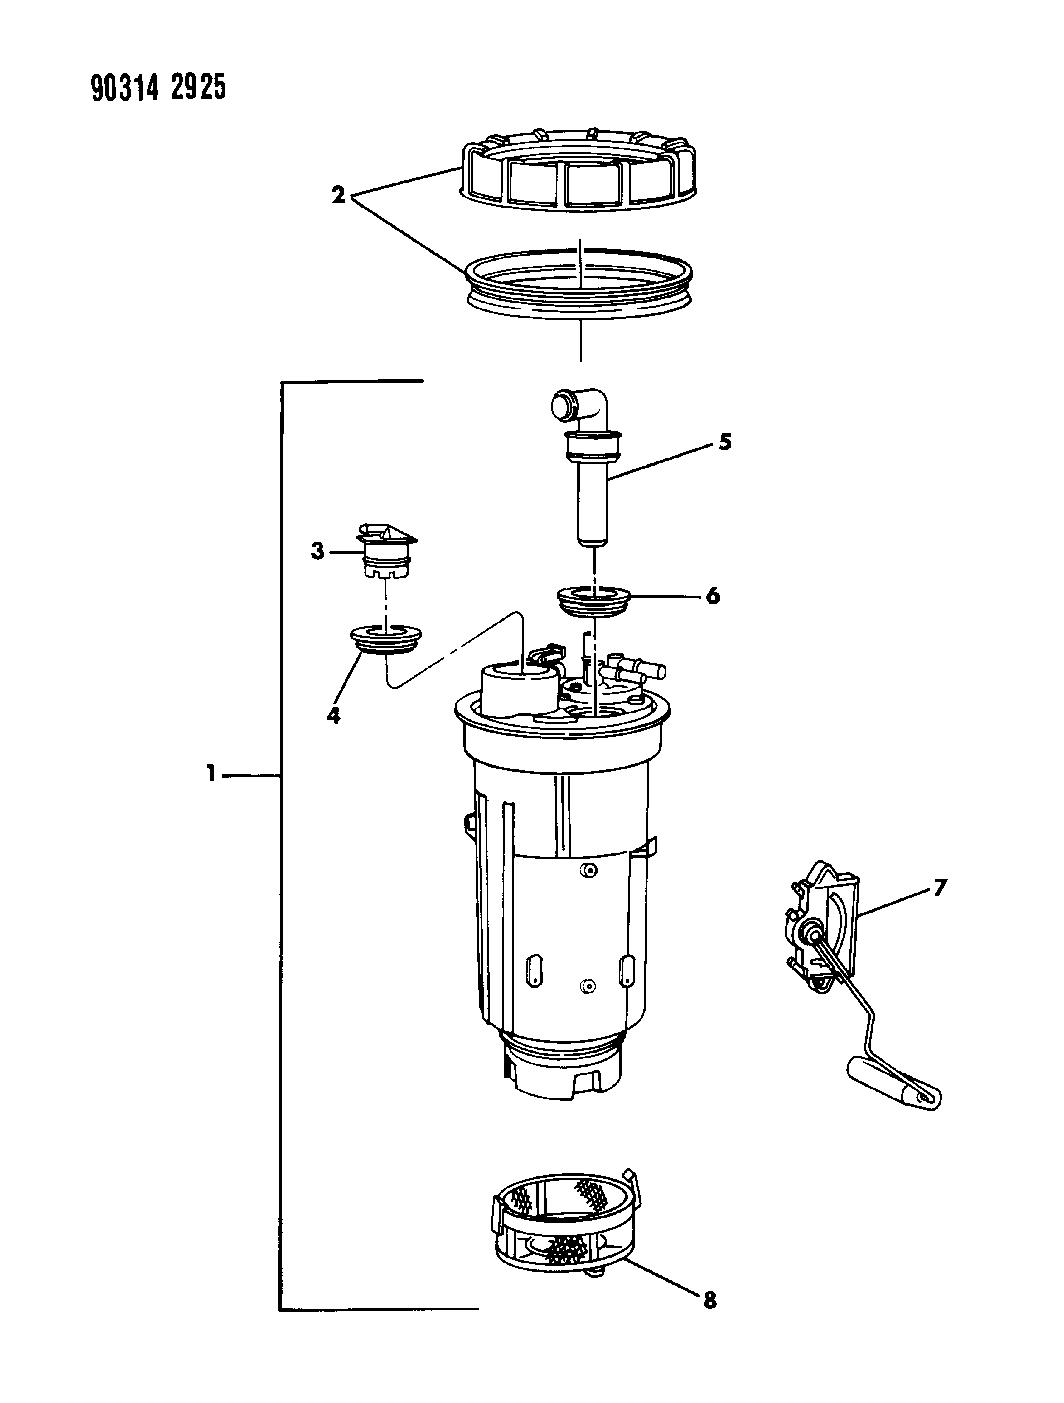 1993 Dodge Dakota Fuel Pump  U0026 Level Unit